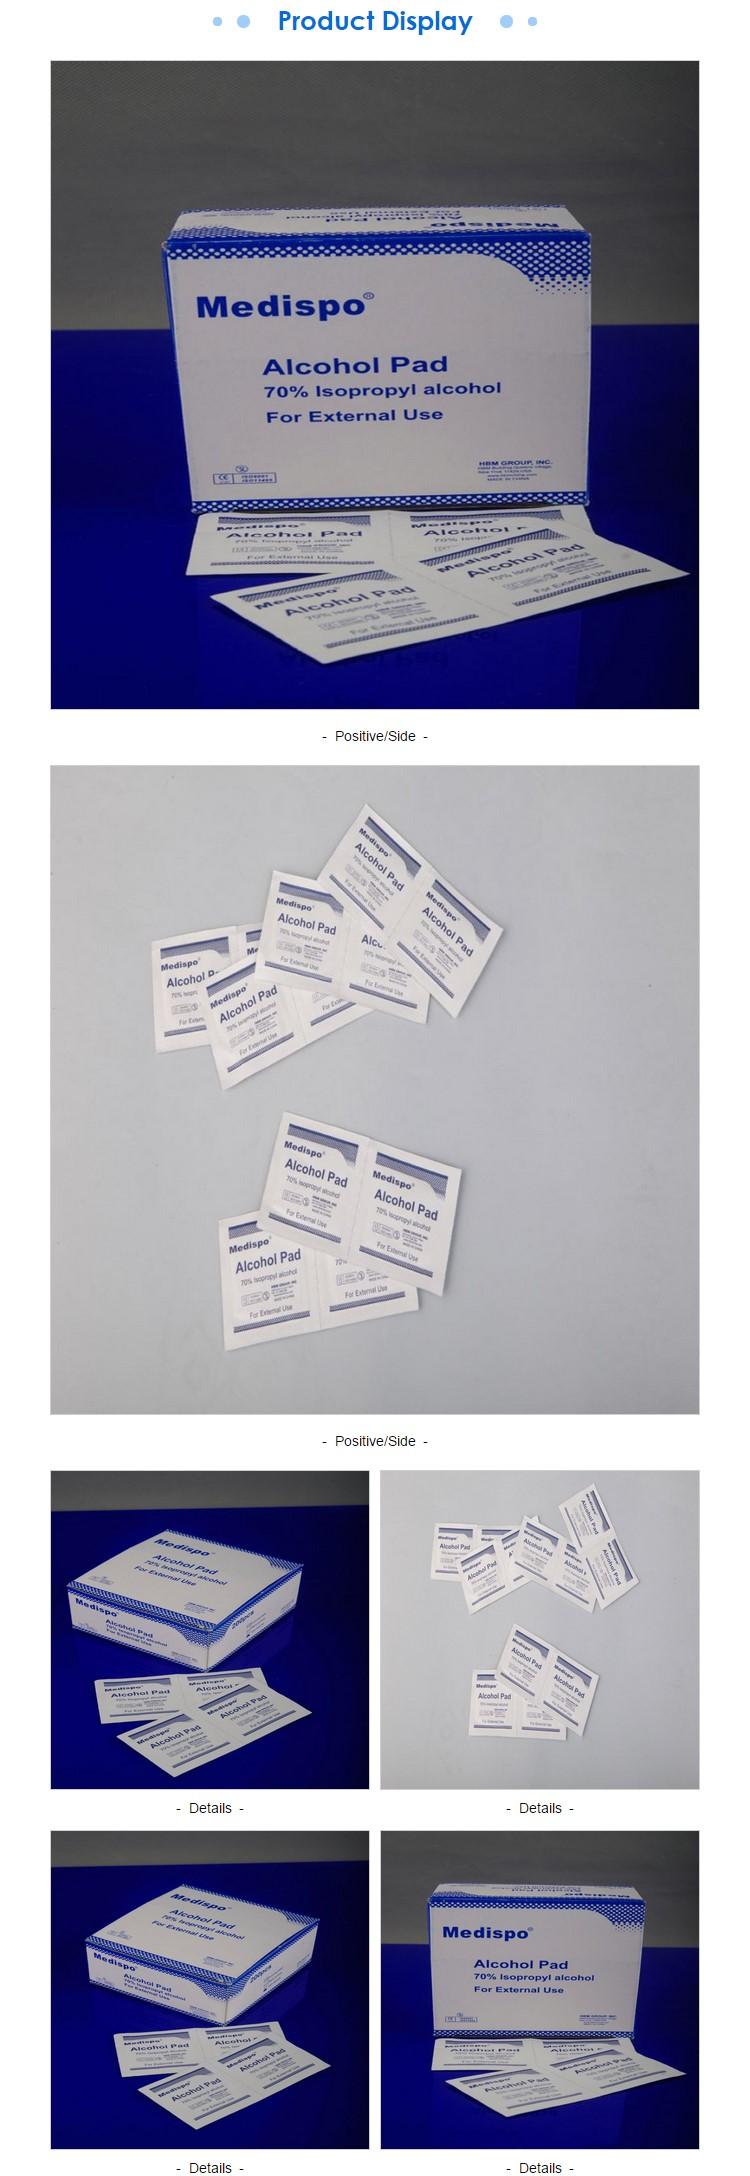 SEN 100 unids Desechables de algod/ón esterilizaci/ón Alcohol Limpia Almohadilla Primeros Auxilios desinfecci/ón Blanco